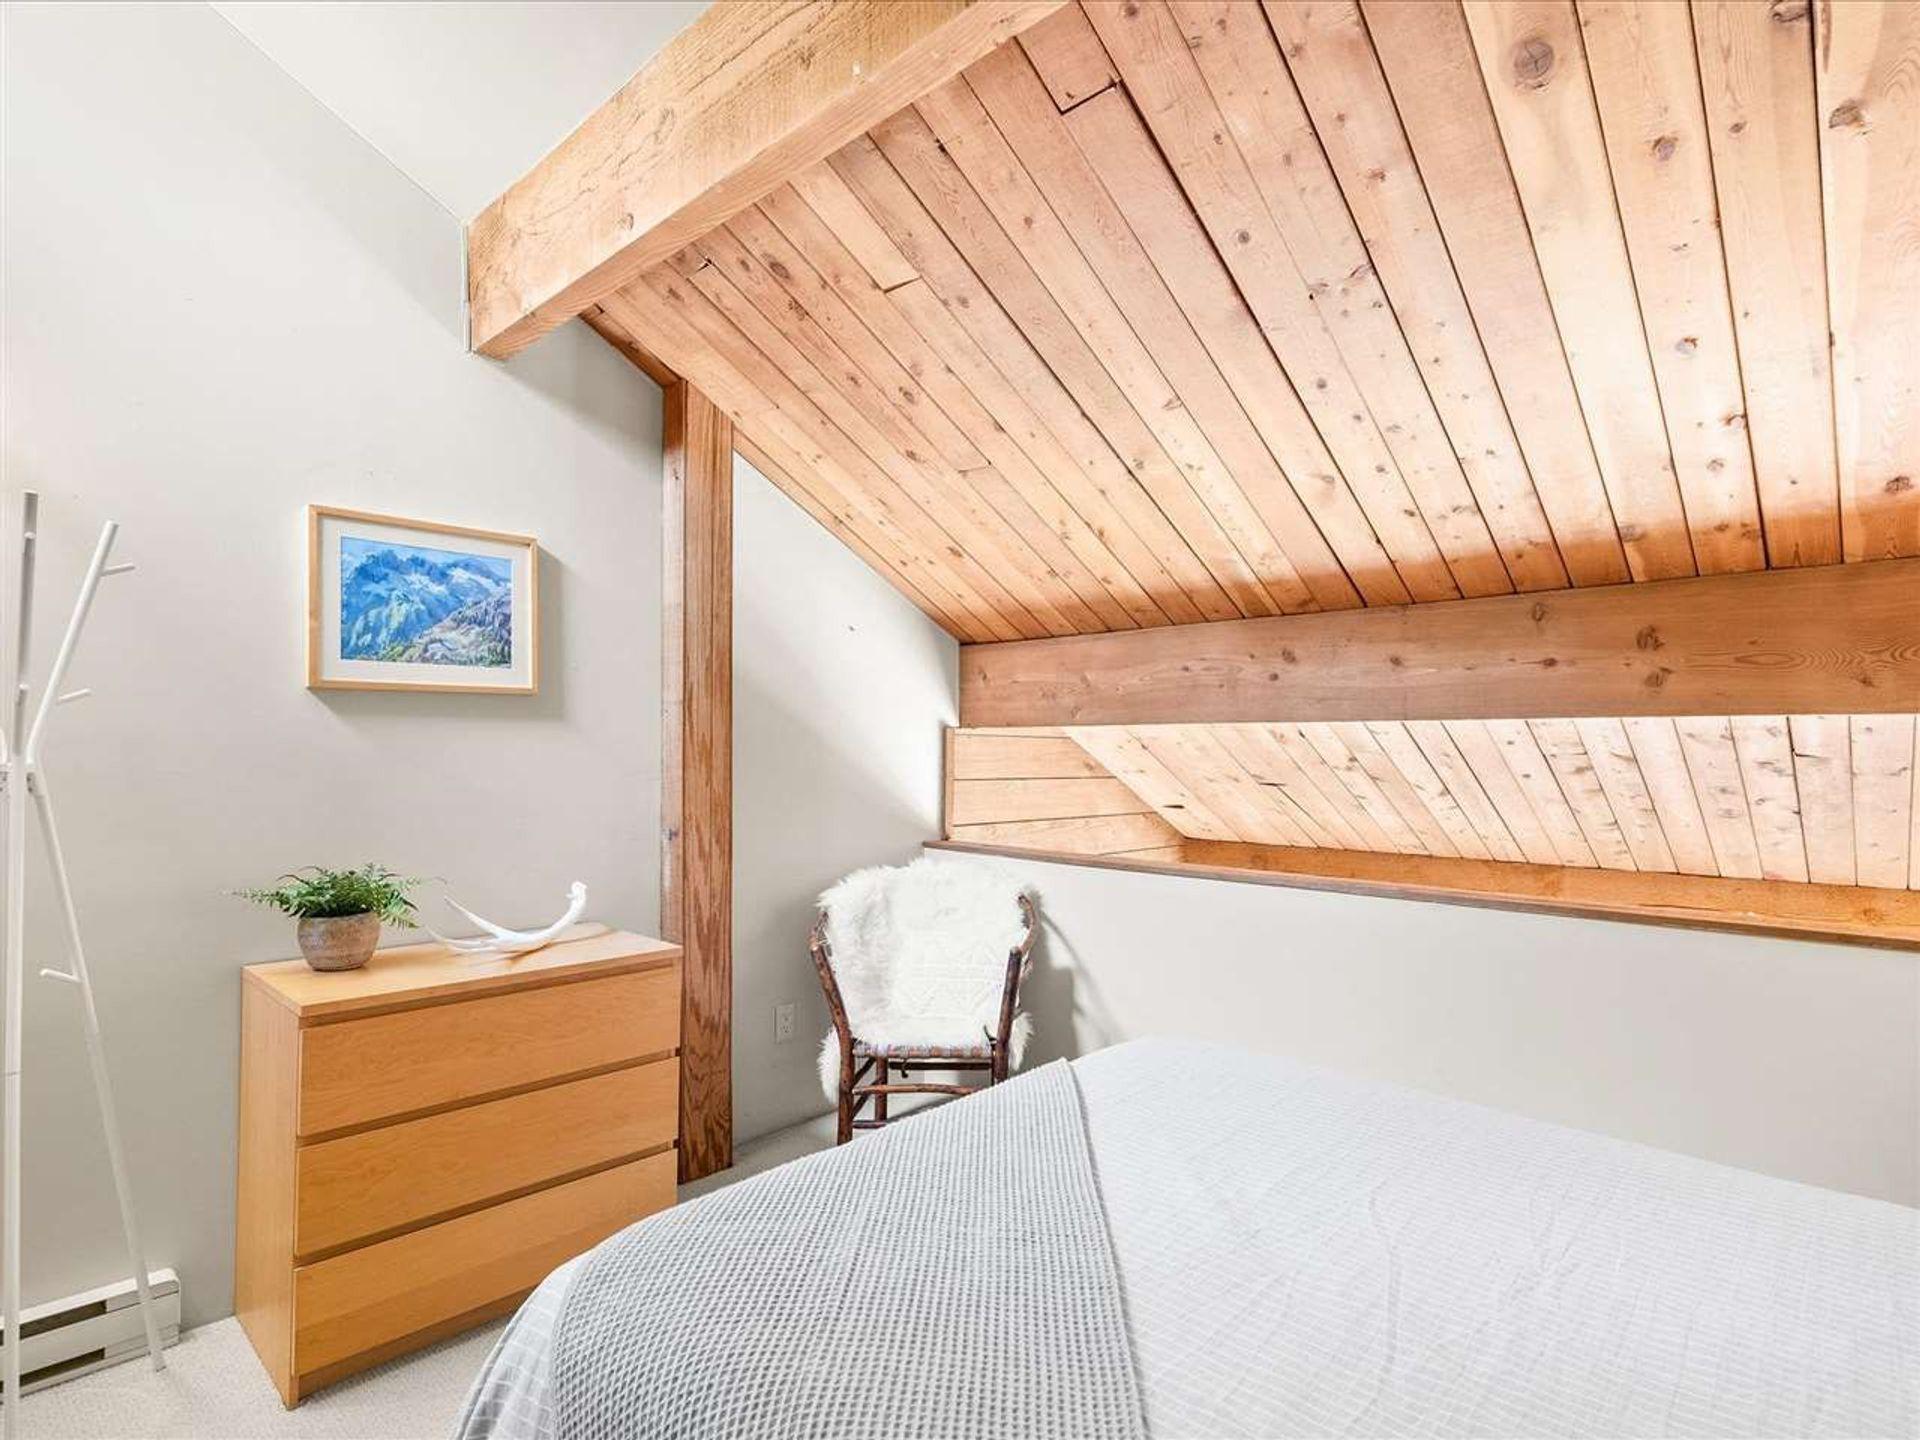 6900-crabapple-drive-whistler-cay-estates-whistler-17 at D8 - 6900 Crabapple Drive, Whistler Cay Estates, Whistler